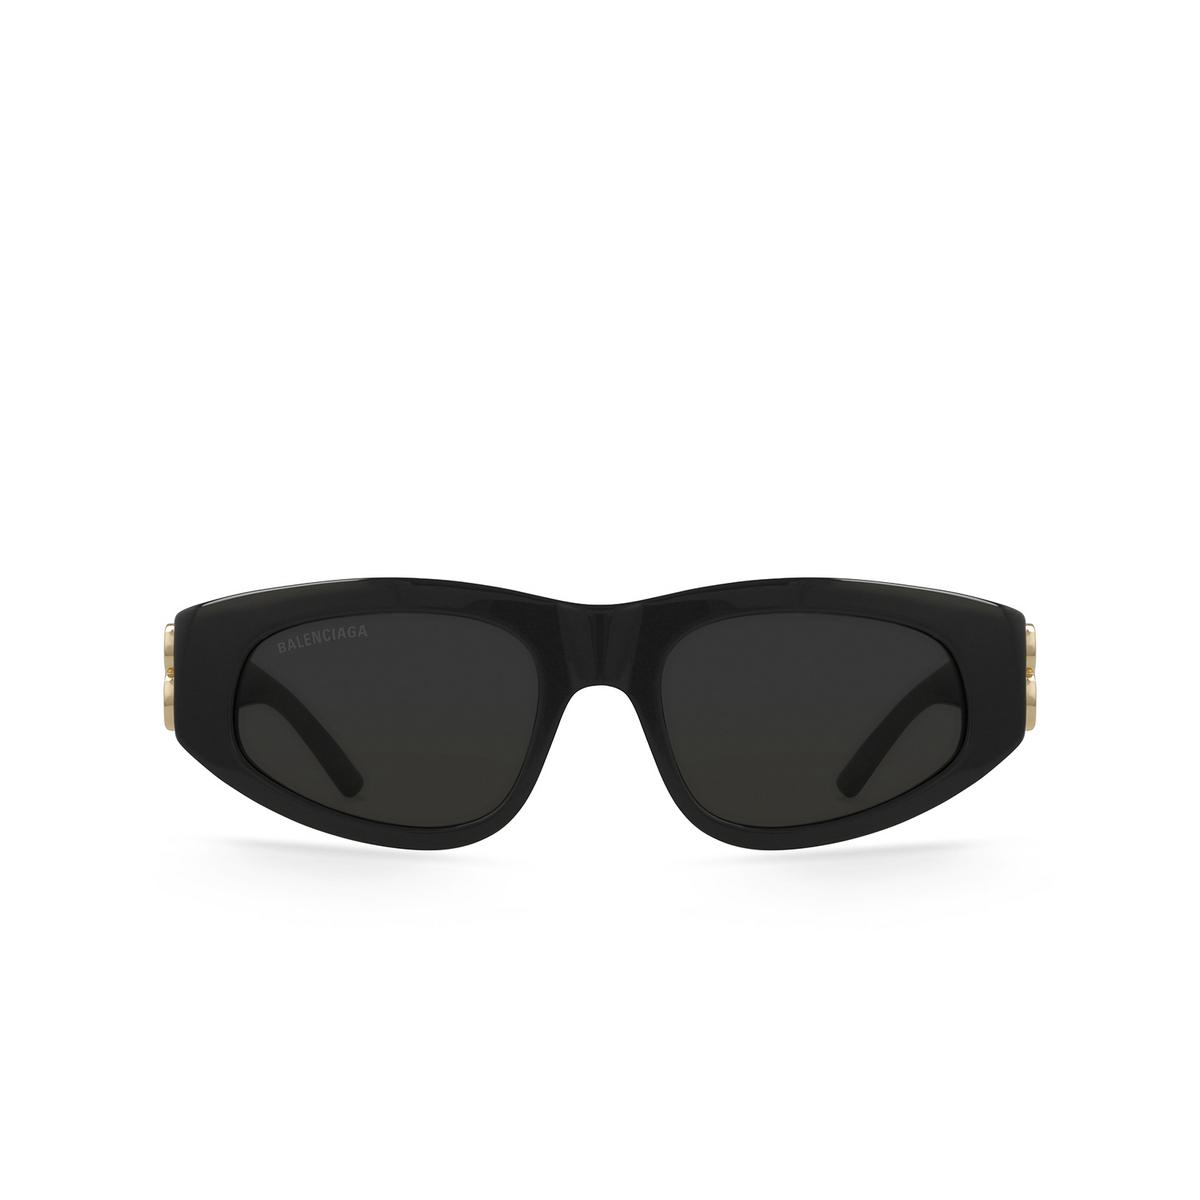 Balenciaga® Oval Sunglasses: BB0095S color Black 001 - front view.